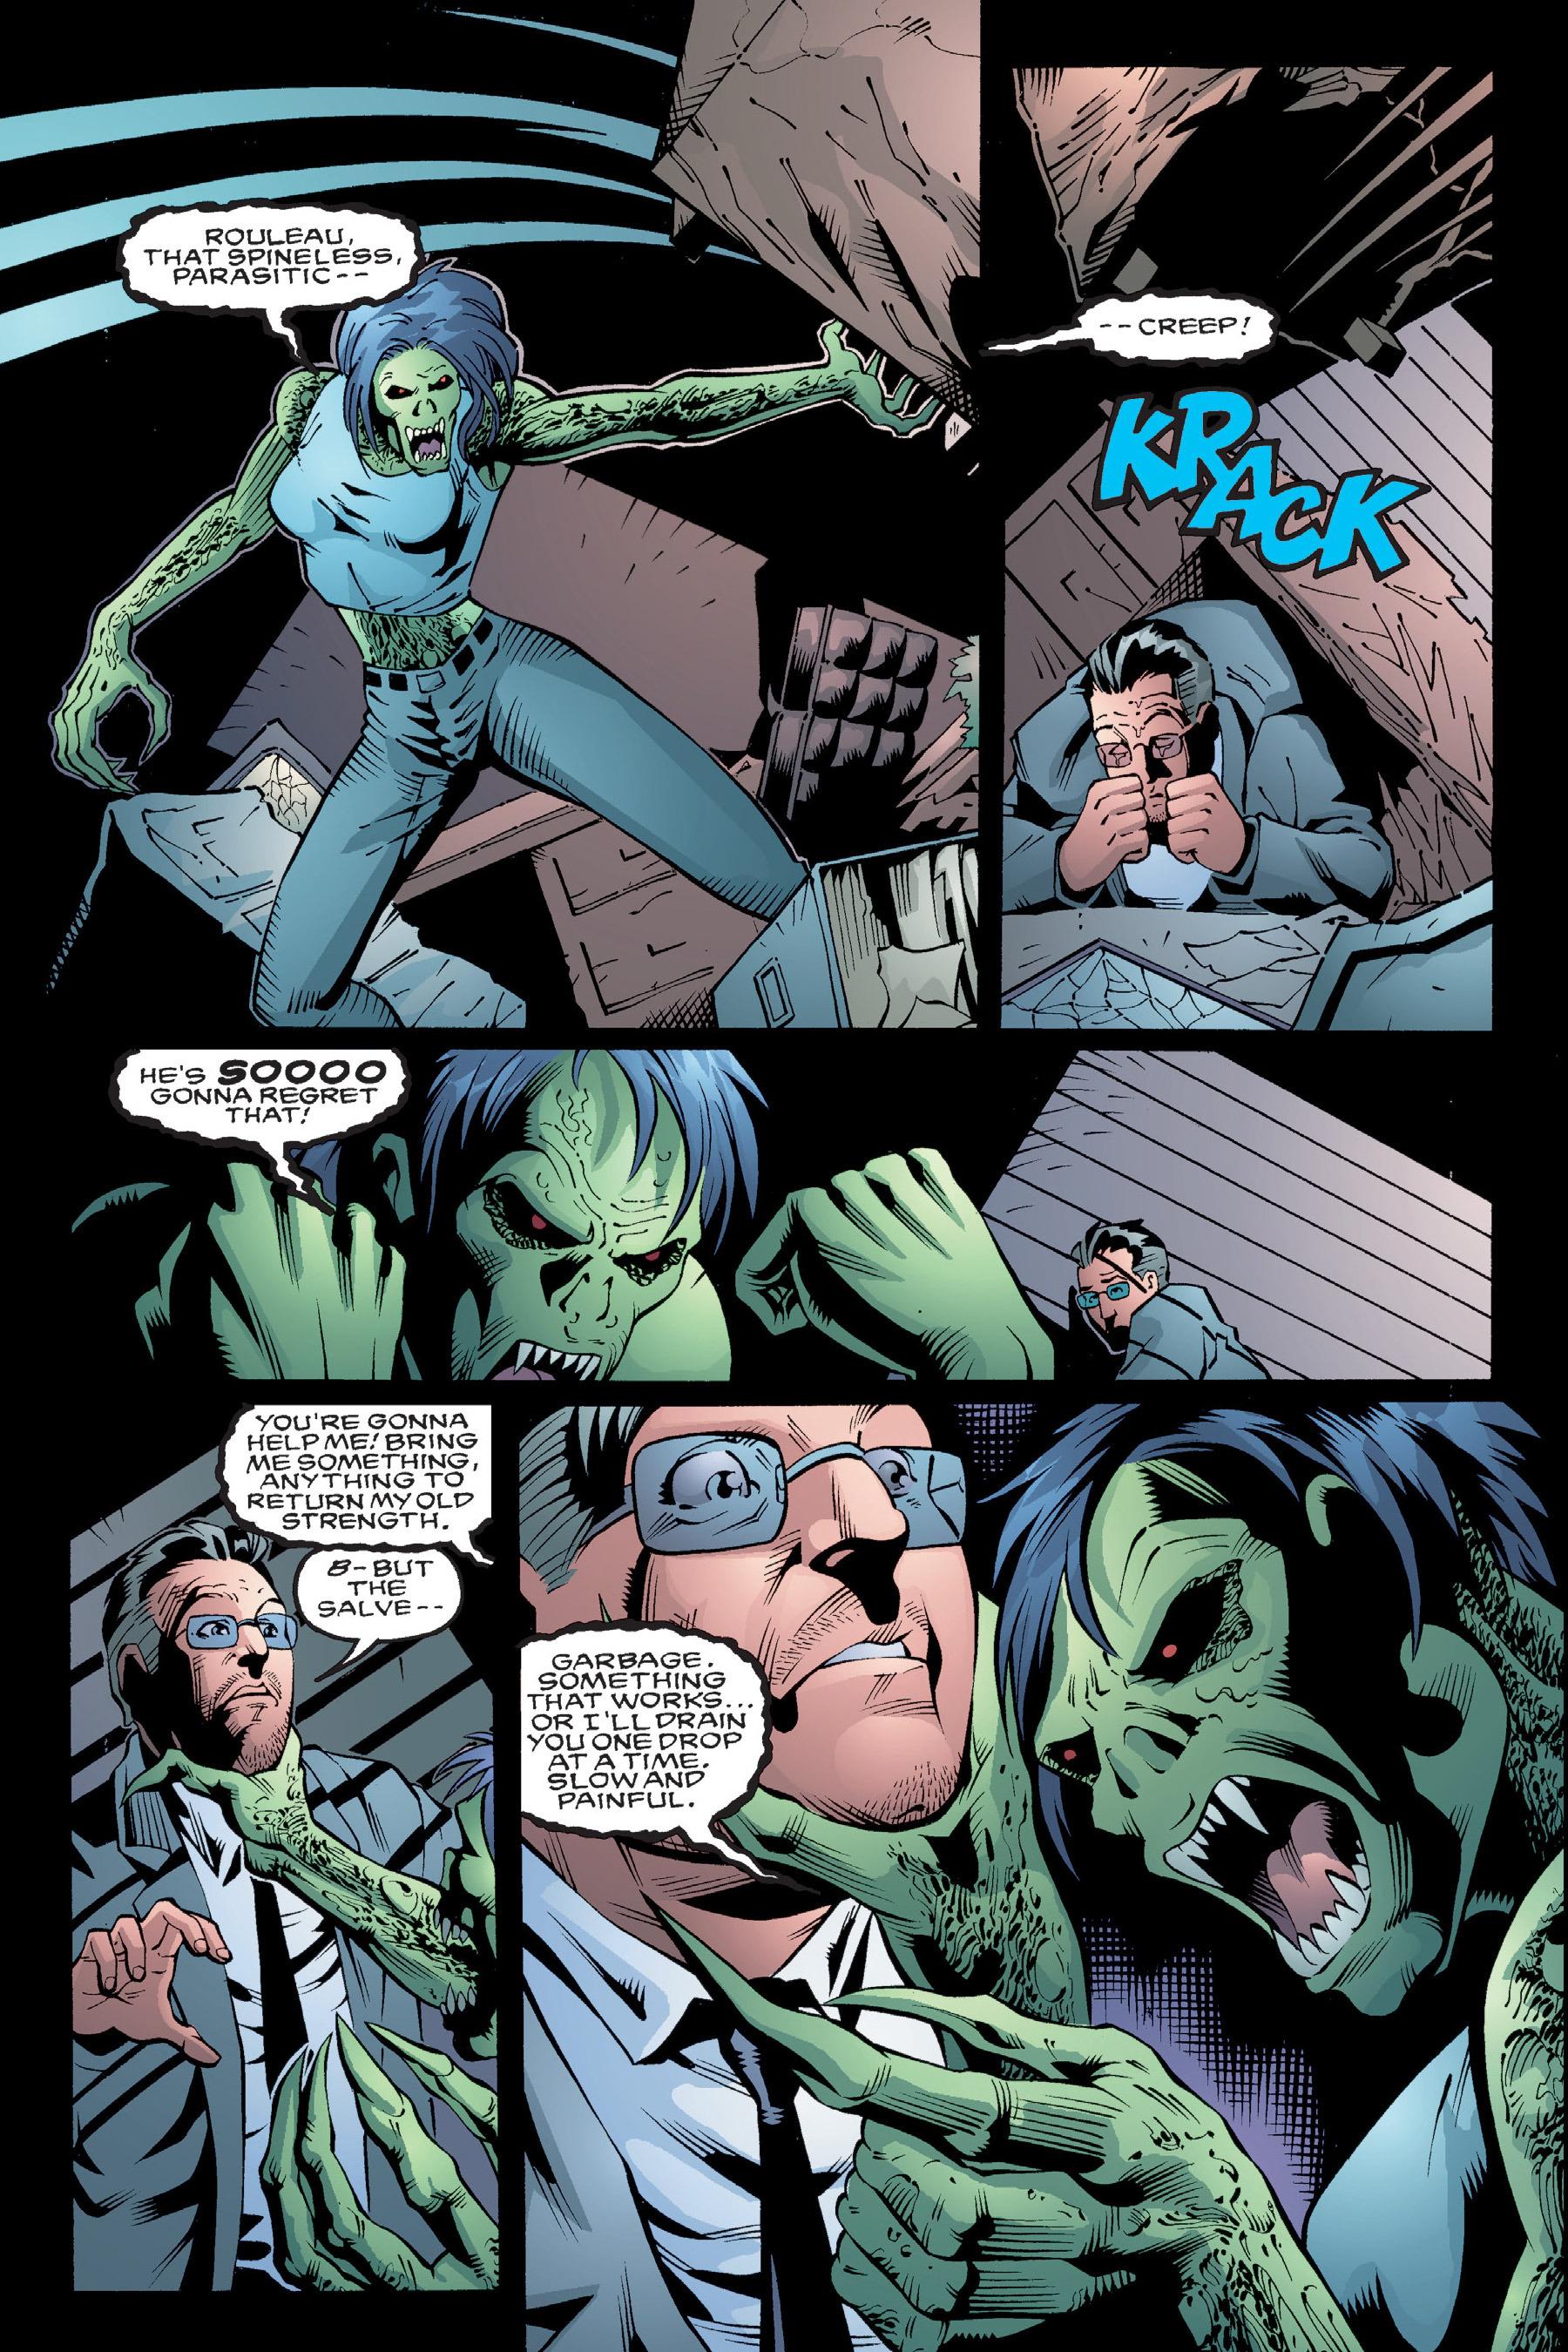 Read online Buffy the Vampire Slayer: Omnibus comic -  Issue # TPB 4 - 53